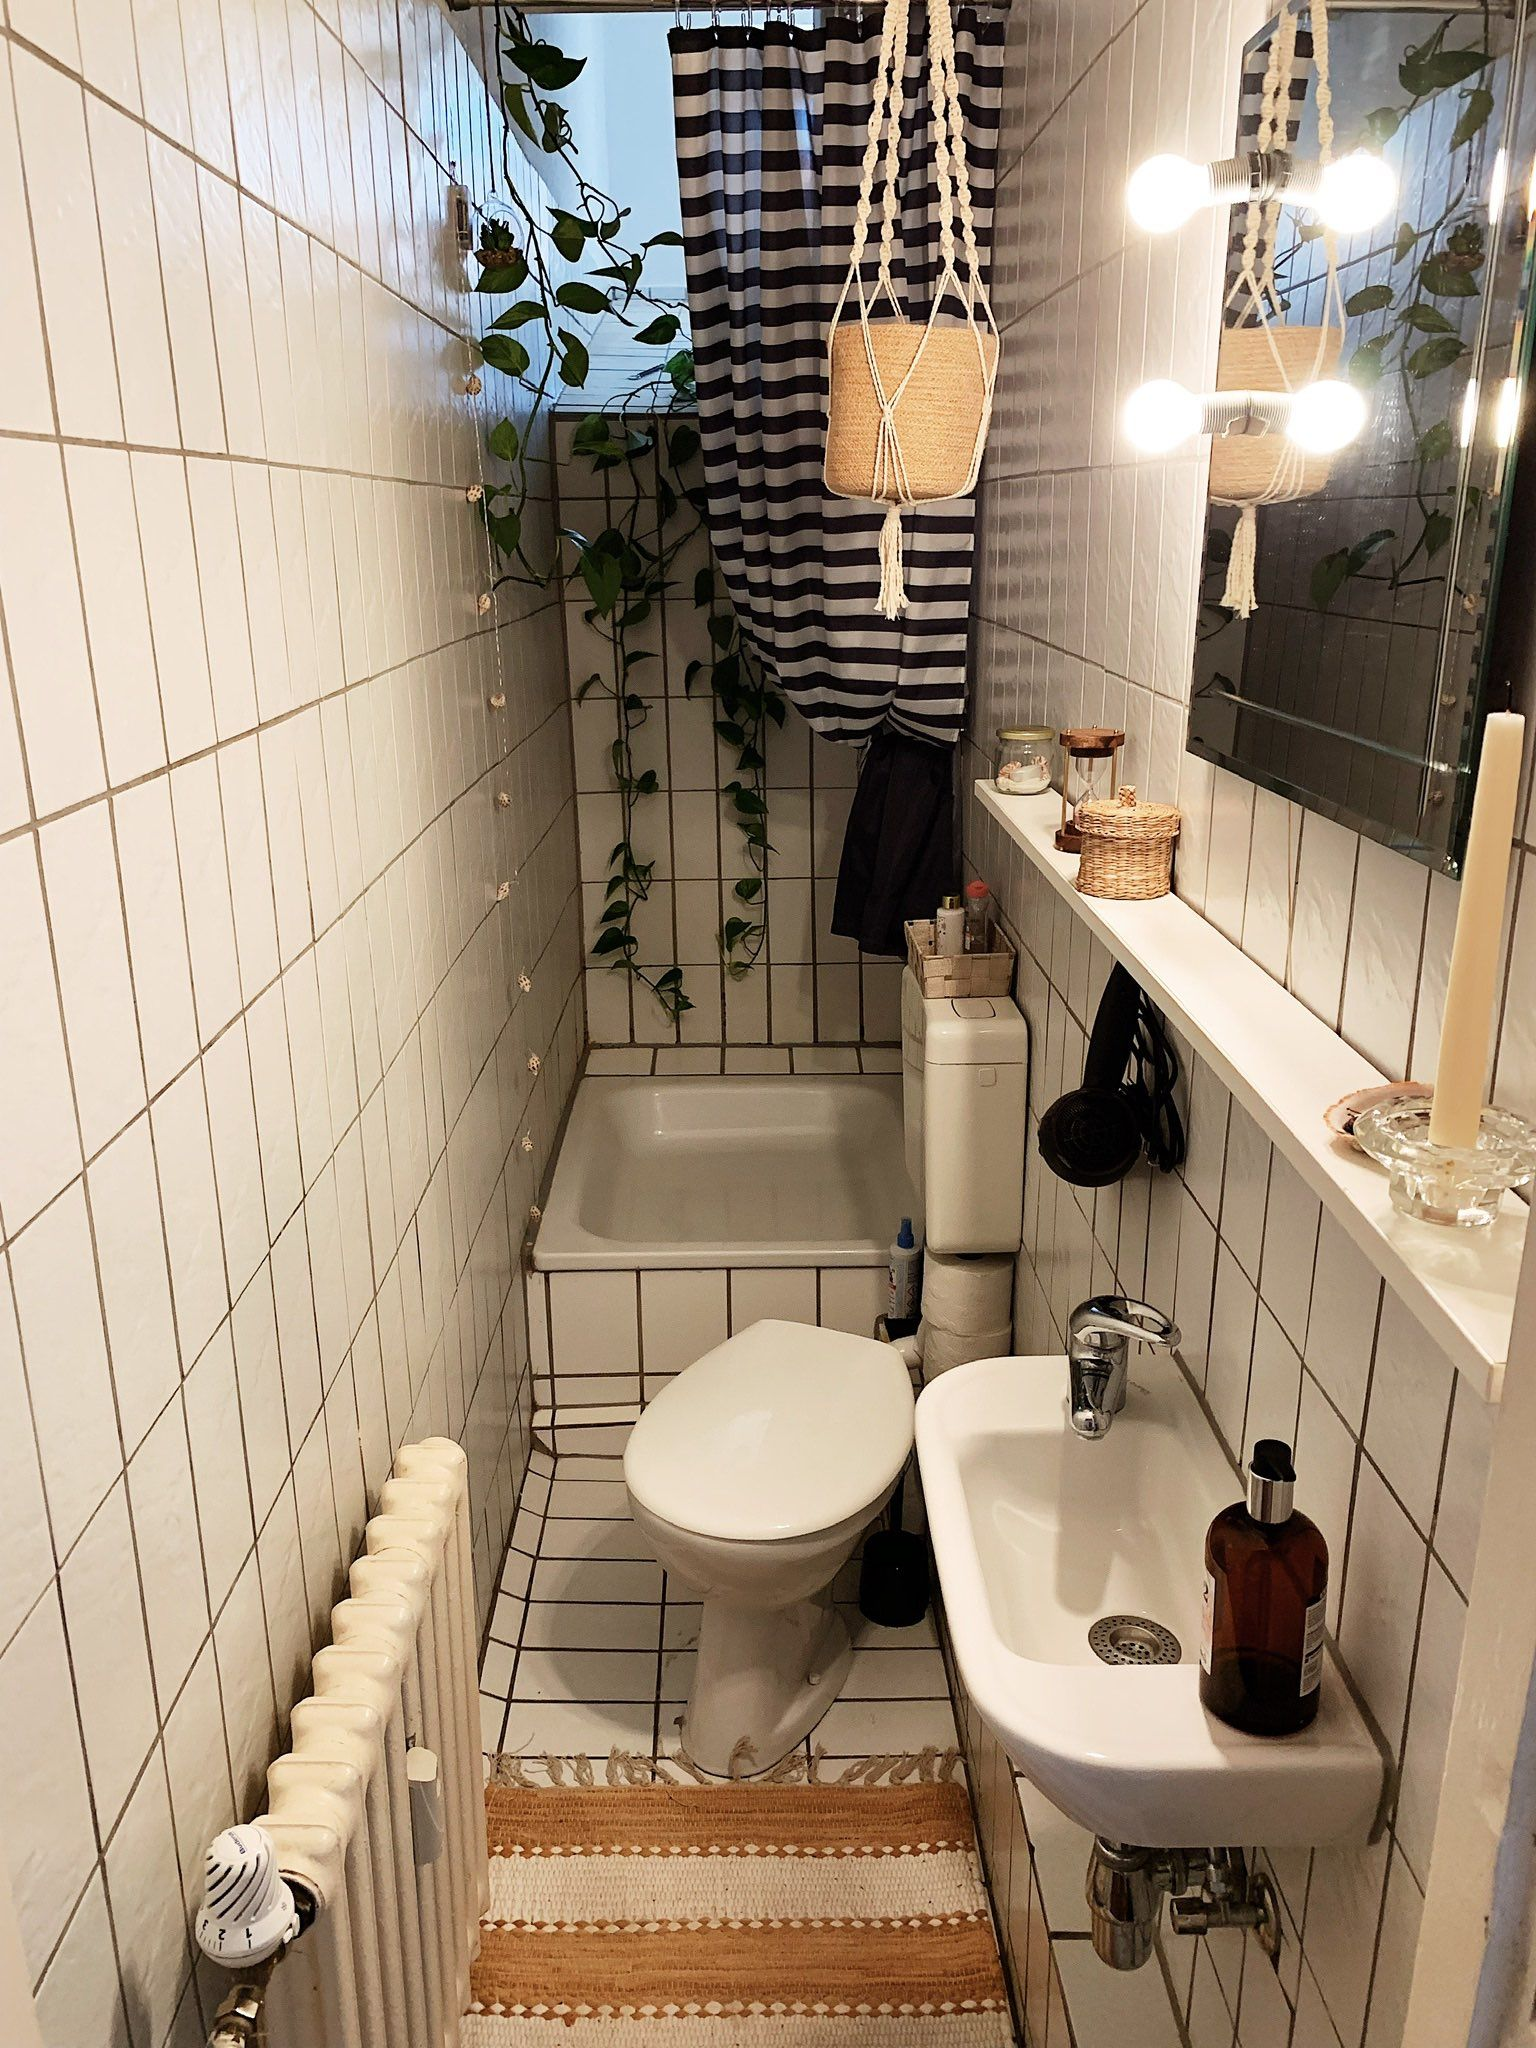 schmales, helles Tageslichtbad in Berlin #bad #badezimmer #schmal